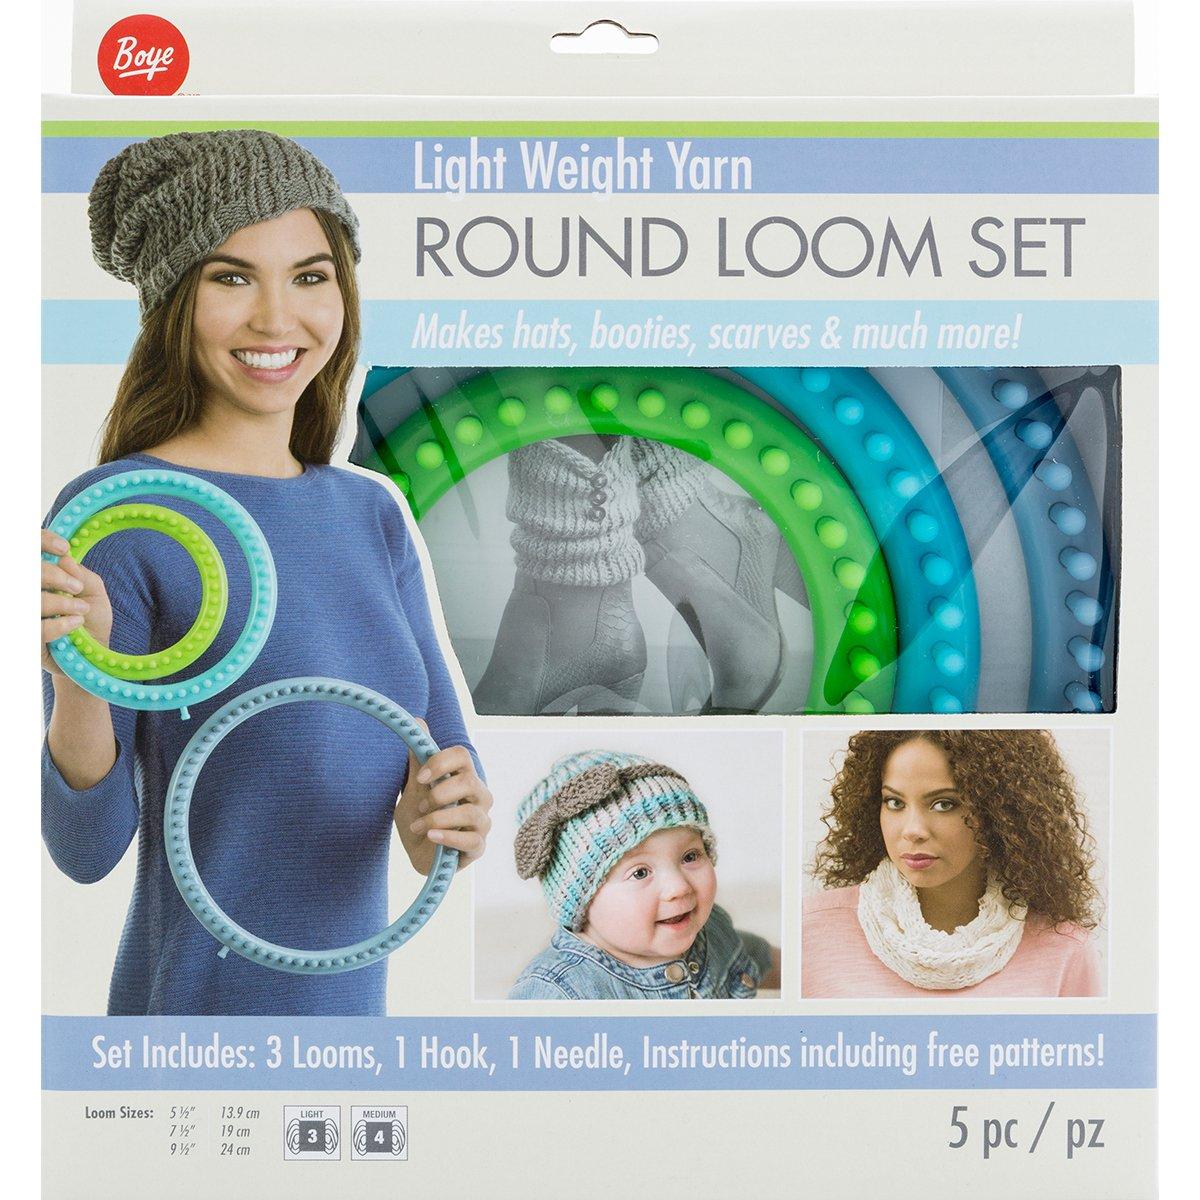 Amazon.com: Boye Artsi2 BOY3702102001 Loom Round Set Light Weight Yarn